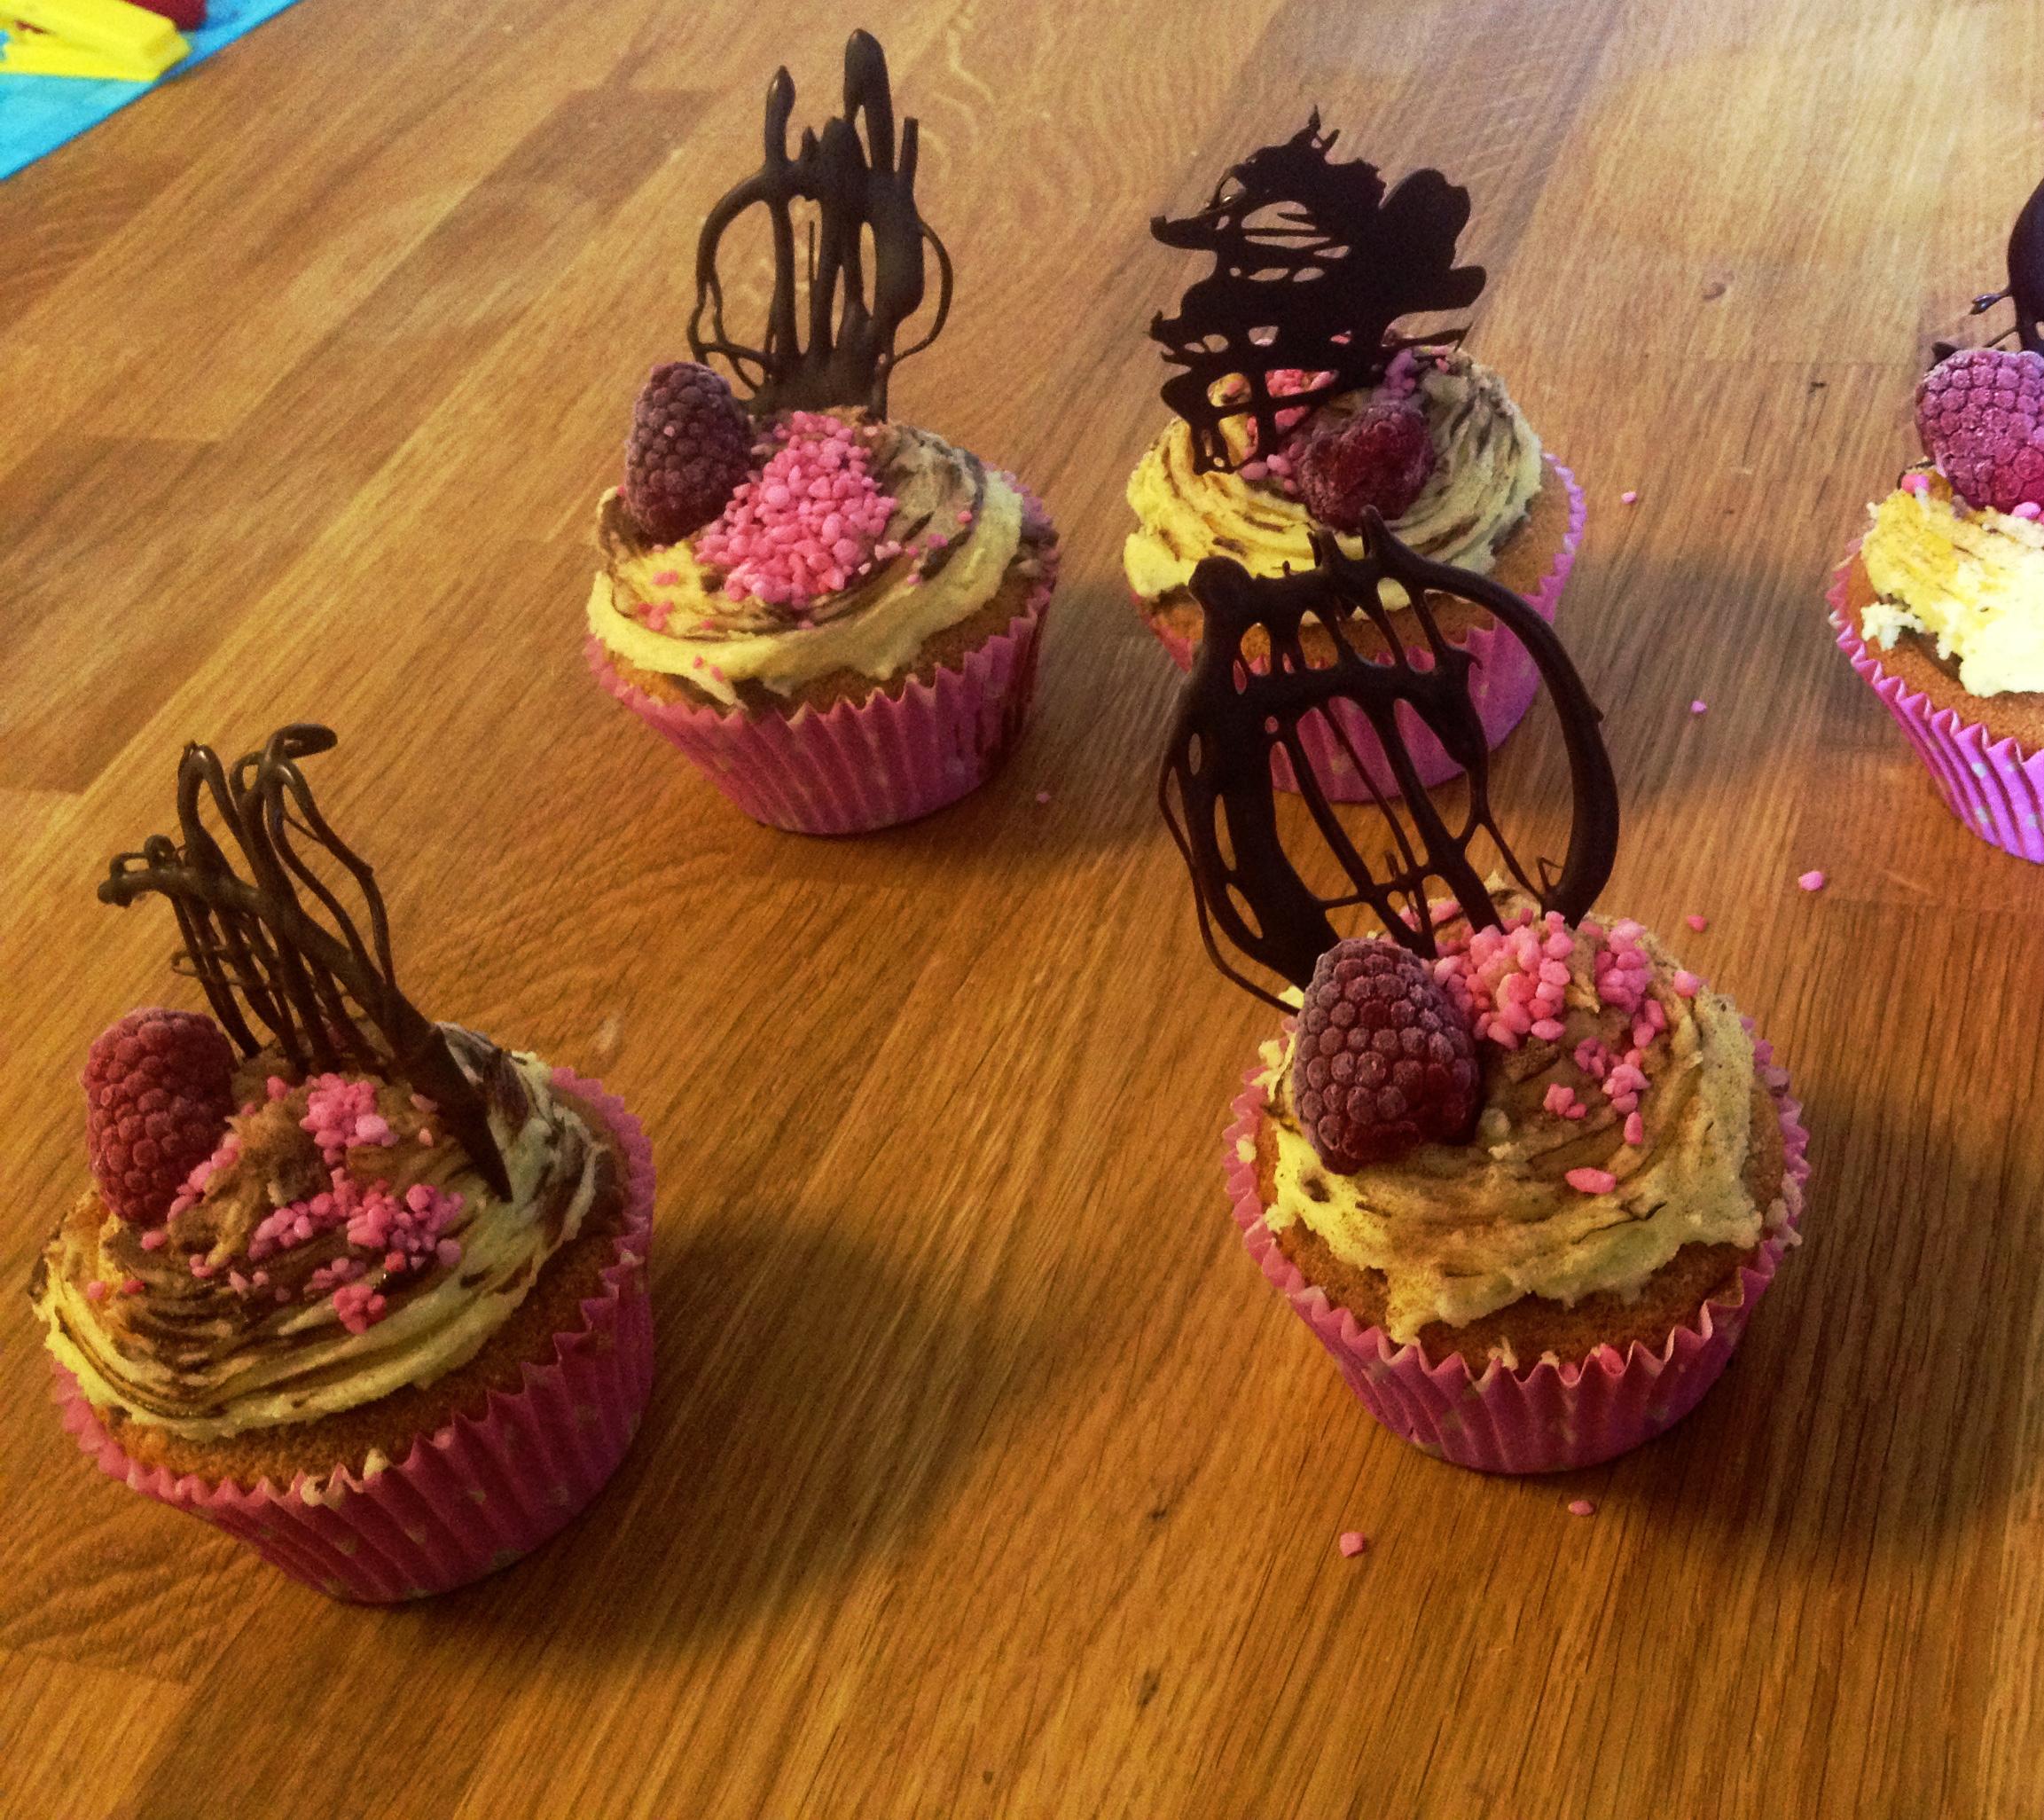 saftiga muffins med gräddfil